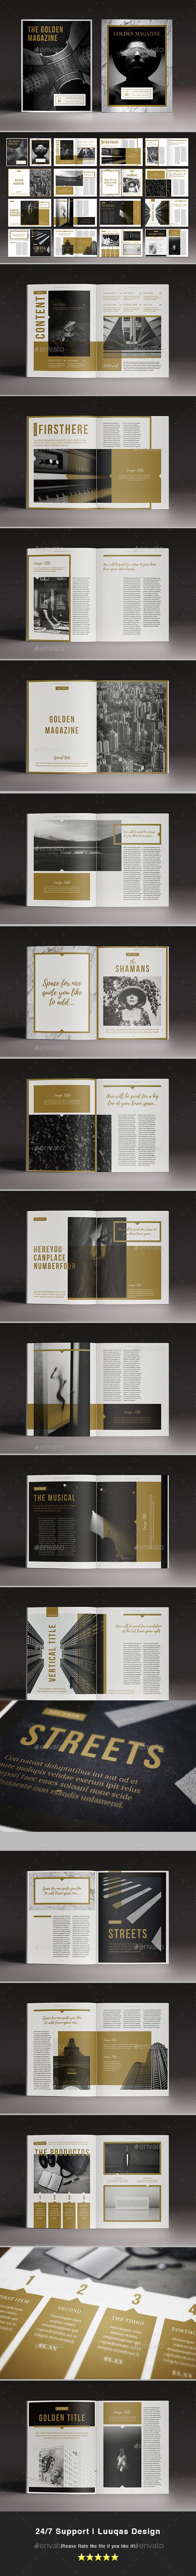 The Golden Magazine Template - Magazines Print Templates